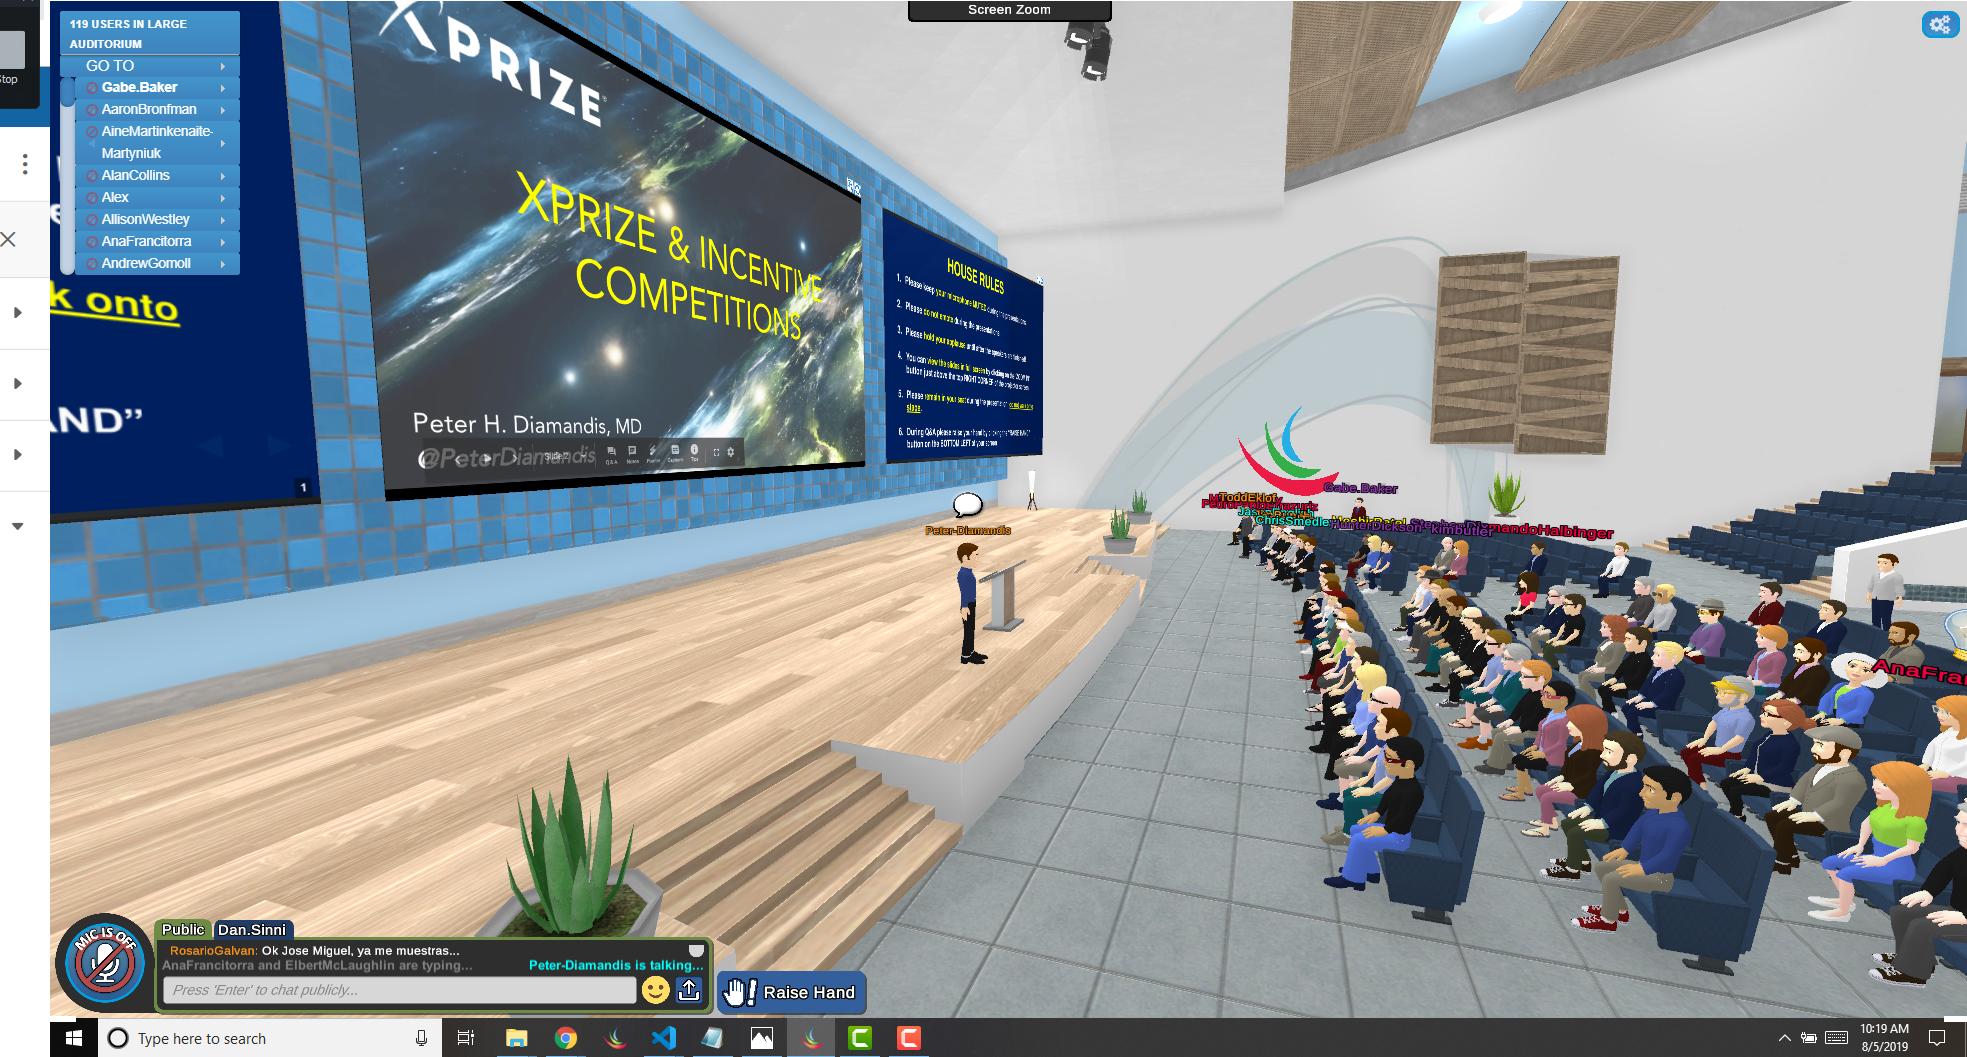 Peter Diamandis Hosts Gathering of Innovators in VirBELA